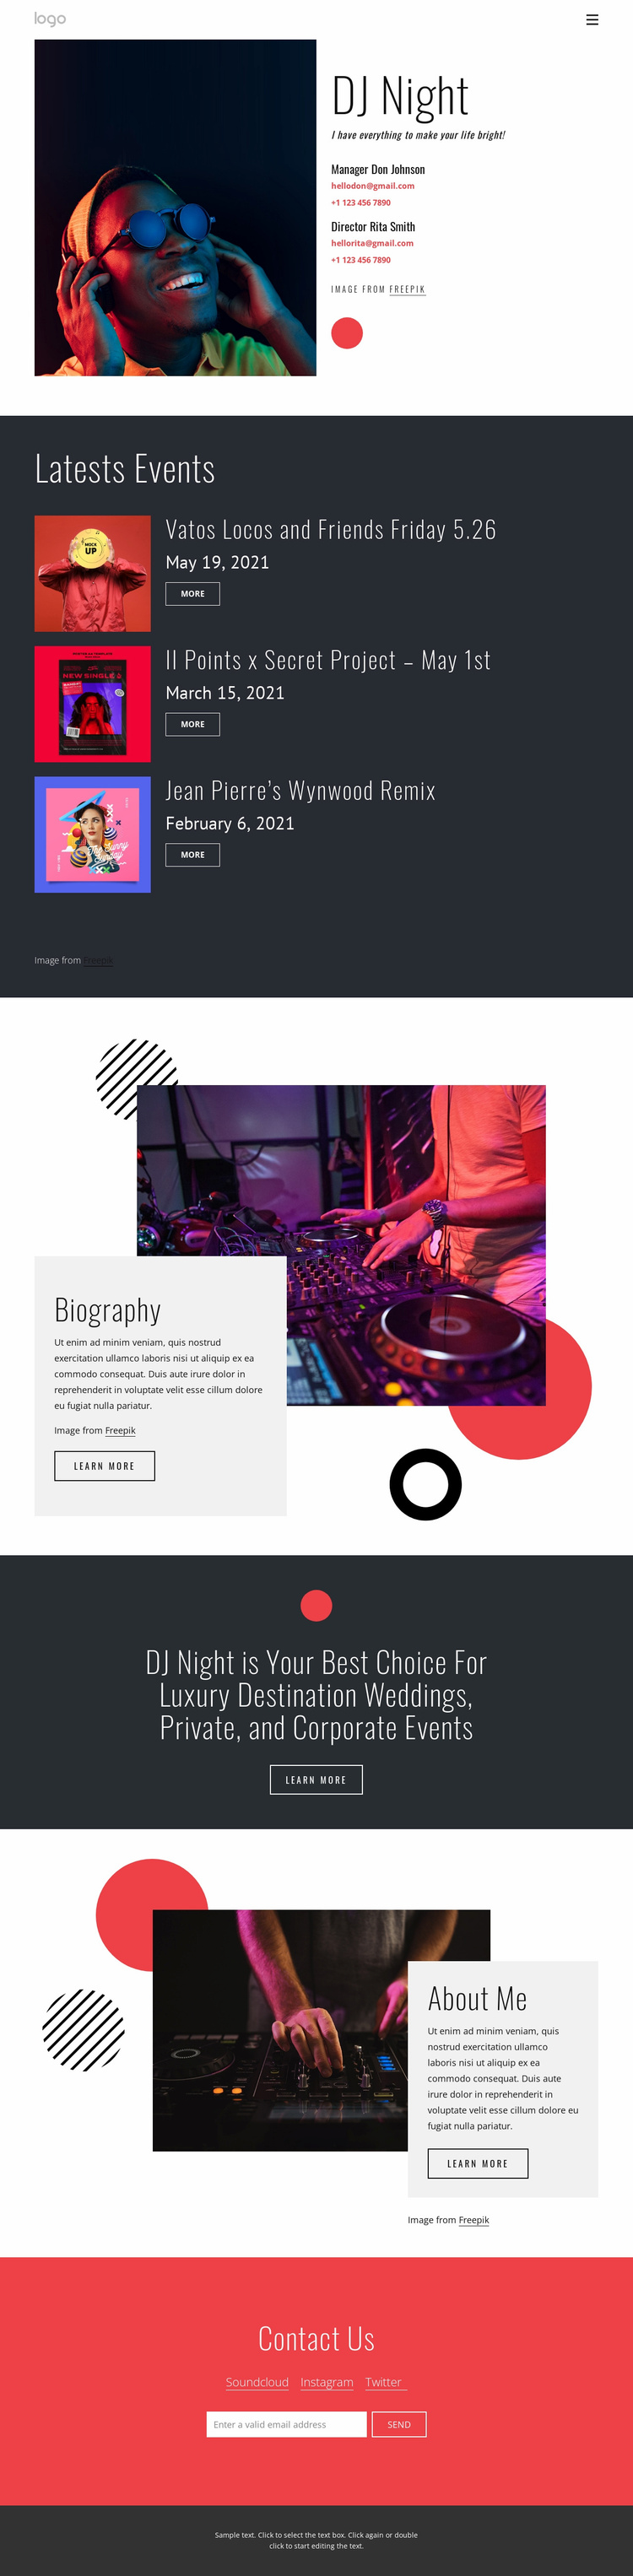 Dj night website Website Template